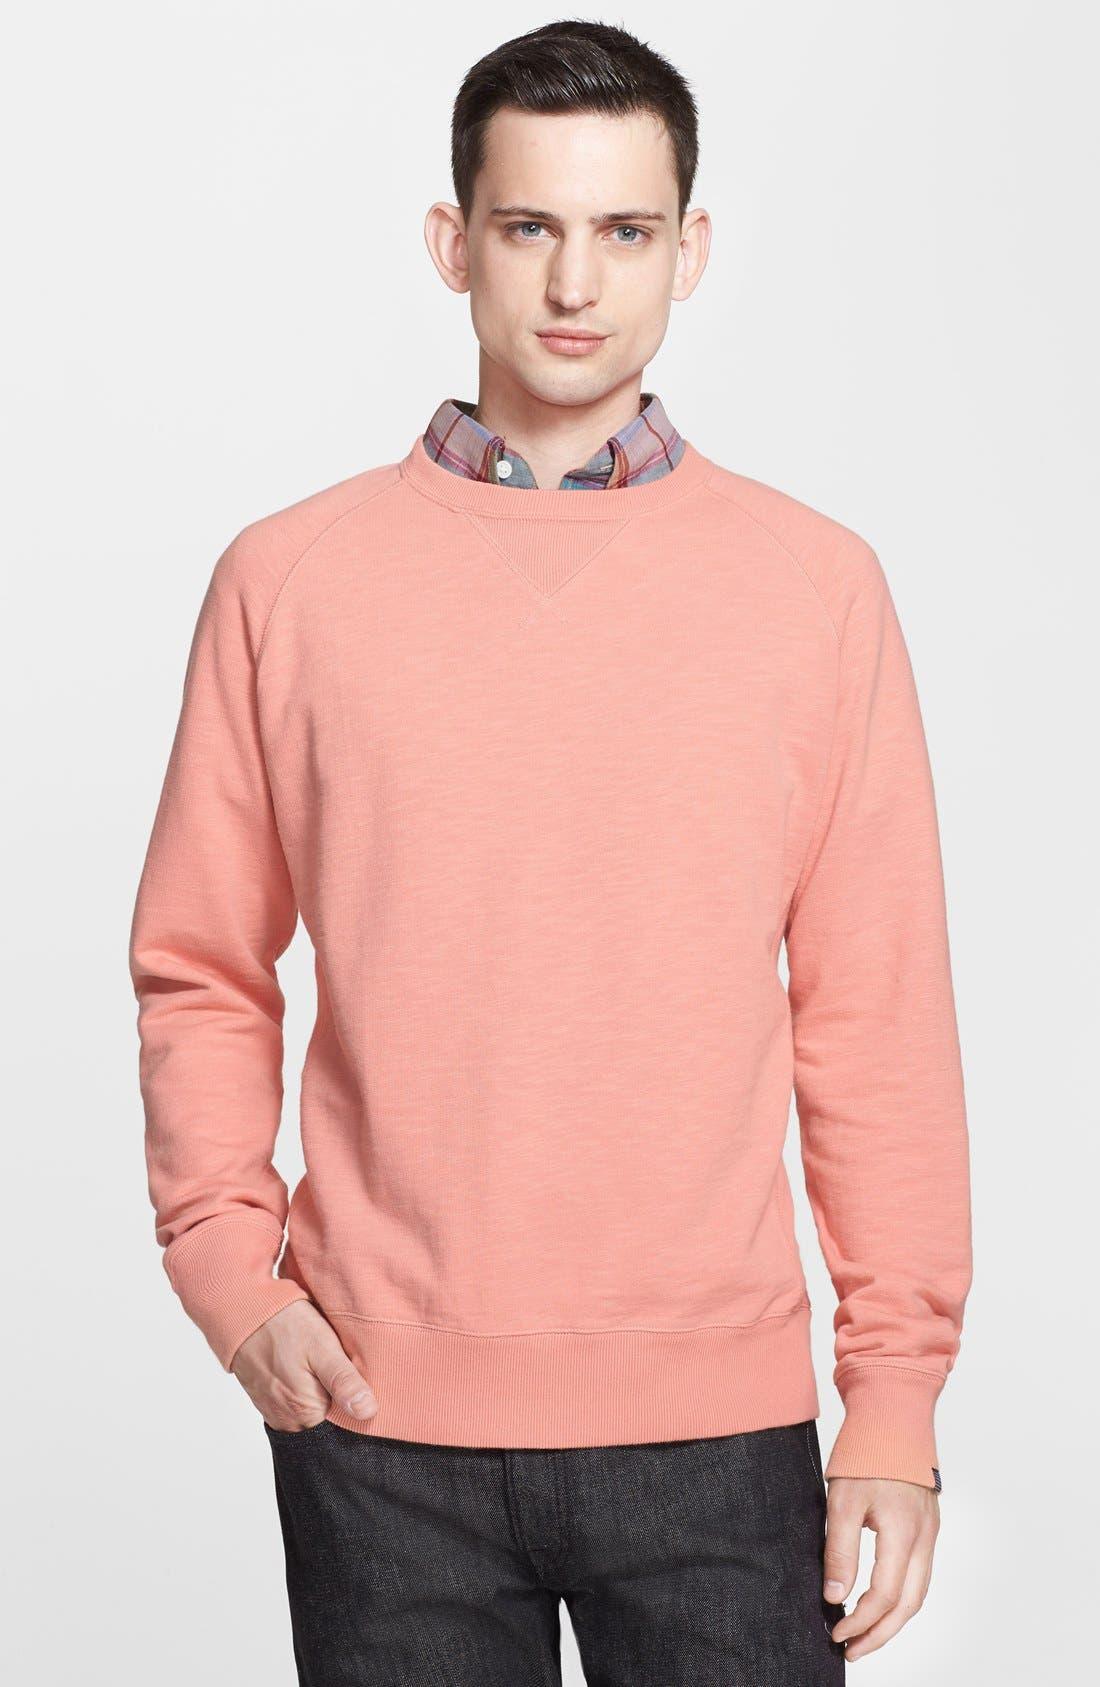 Main Image - Jack Spade 'Price' Crewneck Sweatshirt